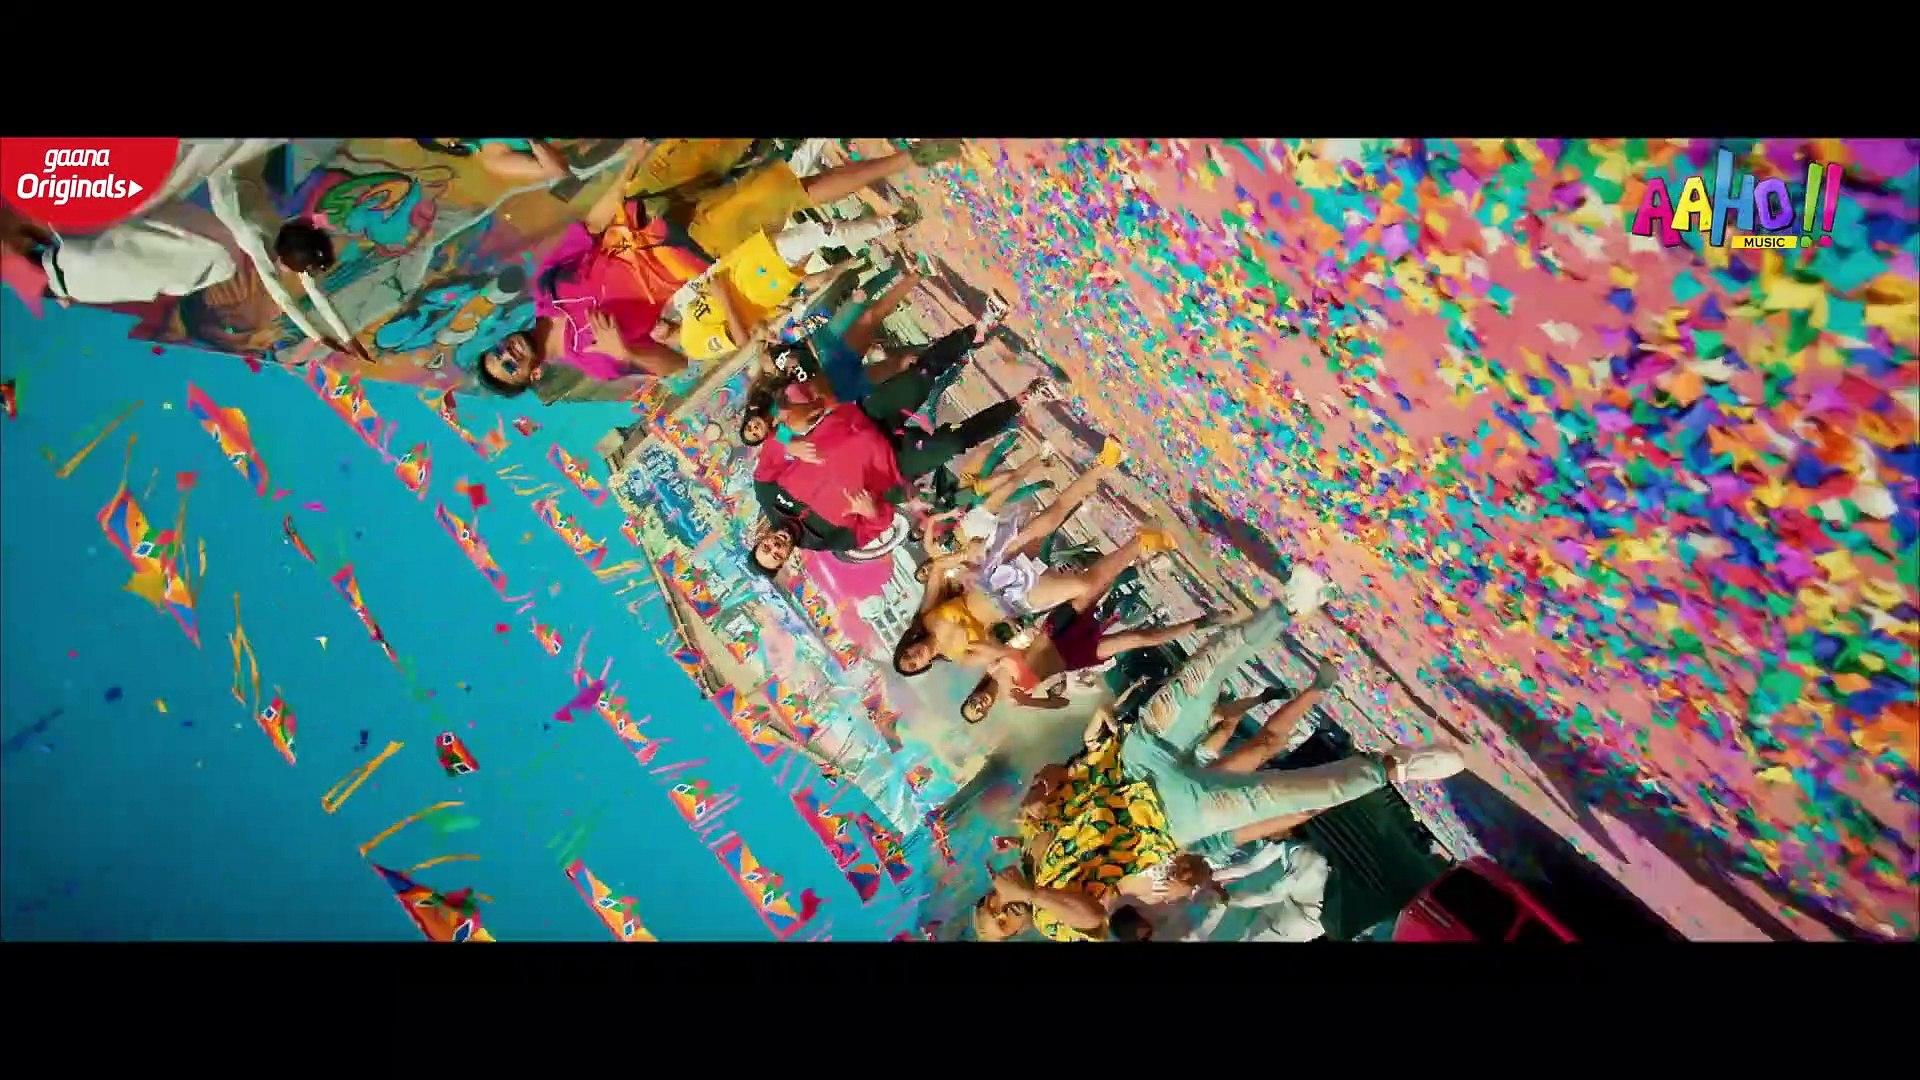 Aaho Mittran Di Yes Hai | Badshah Ft. Nidhhi Agerwal | New Song 2019 | Party Songs | Flixaap